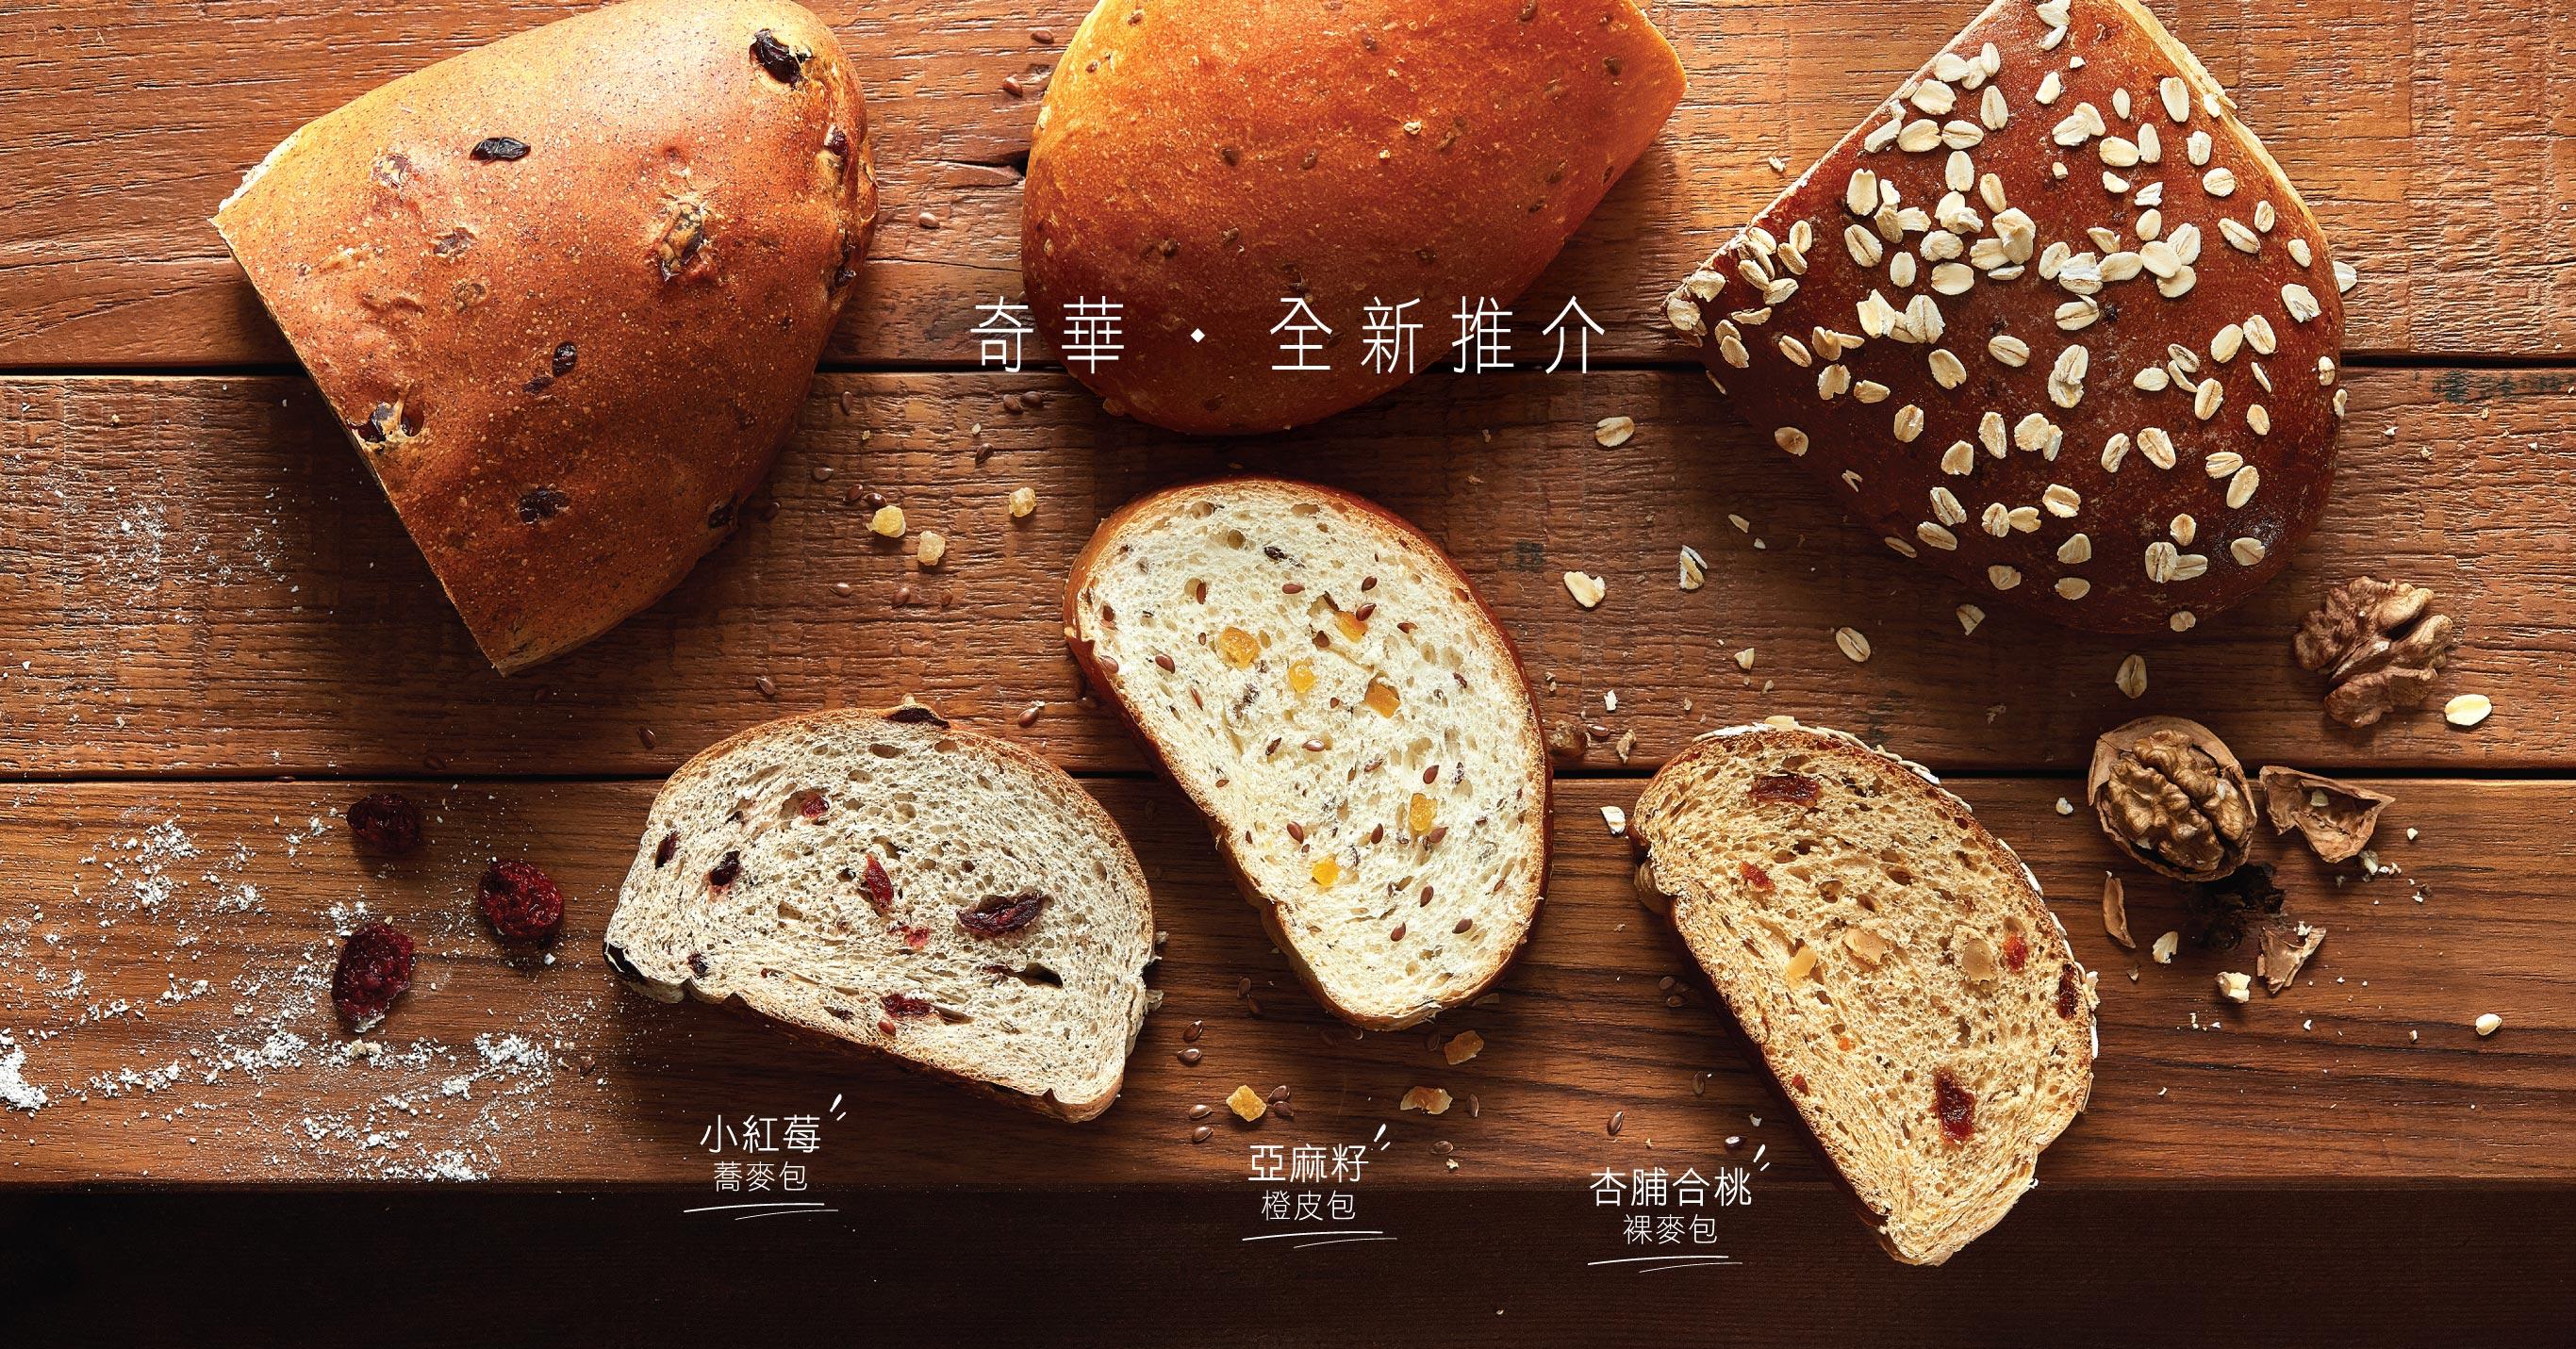 Kee Wah Bakery 奇華網店